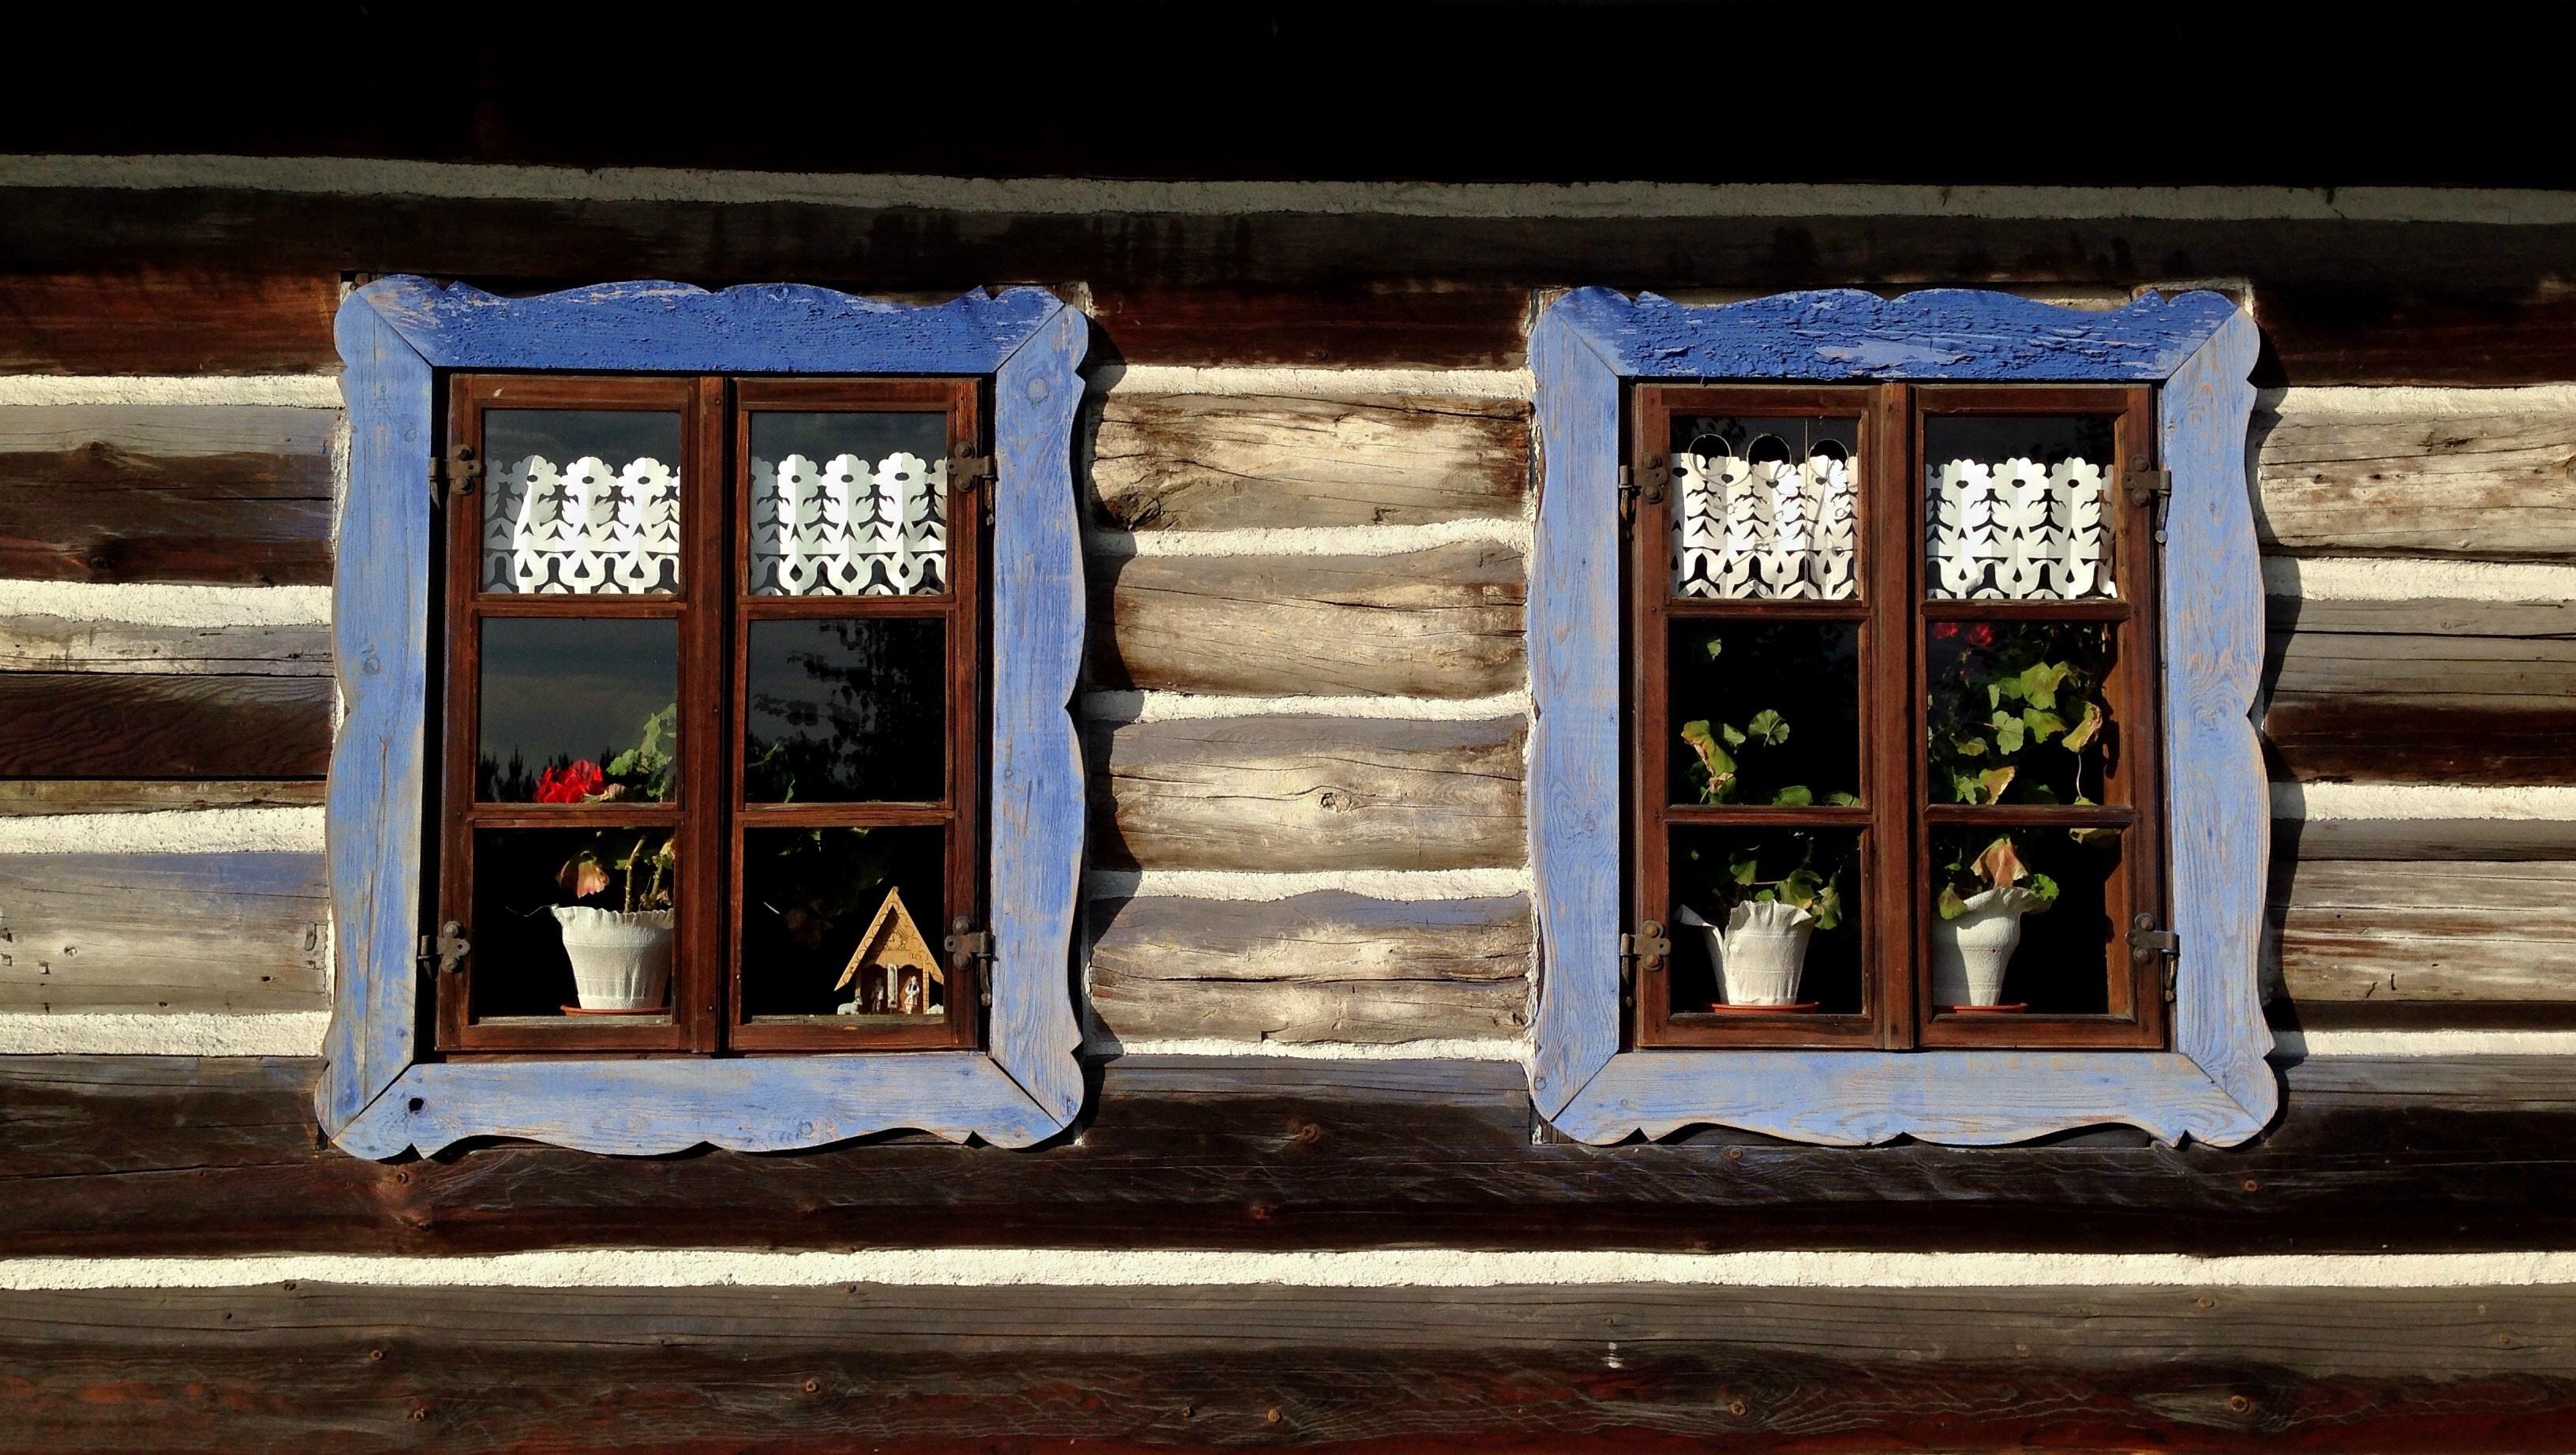 https://get.pxhere.com/photo/wood-window-glass-cottage-color-blue-lighting-art-poland-picture-frame-the-window-open-air-museum-malopolska-wygie-z-w-silesian-voivodeship-852650.jpg